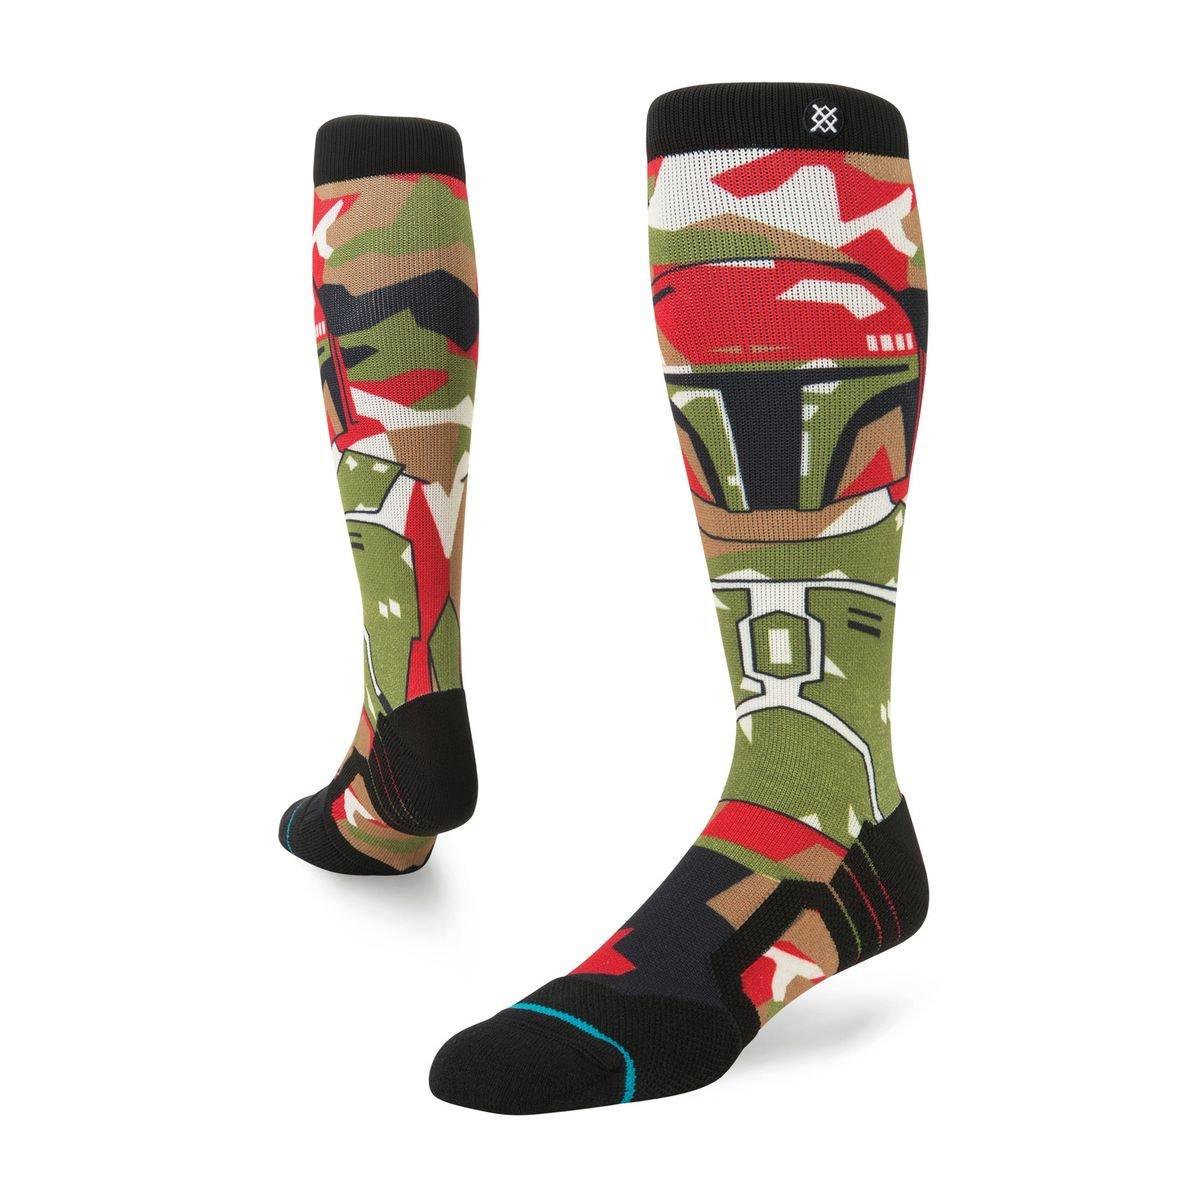 Stance Star Wars Boba Fett Snow Socks - Olive Medium Stance Socks M758D17BOB-OLV-M